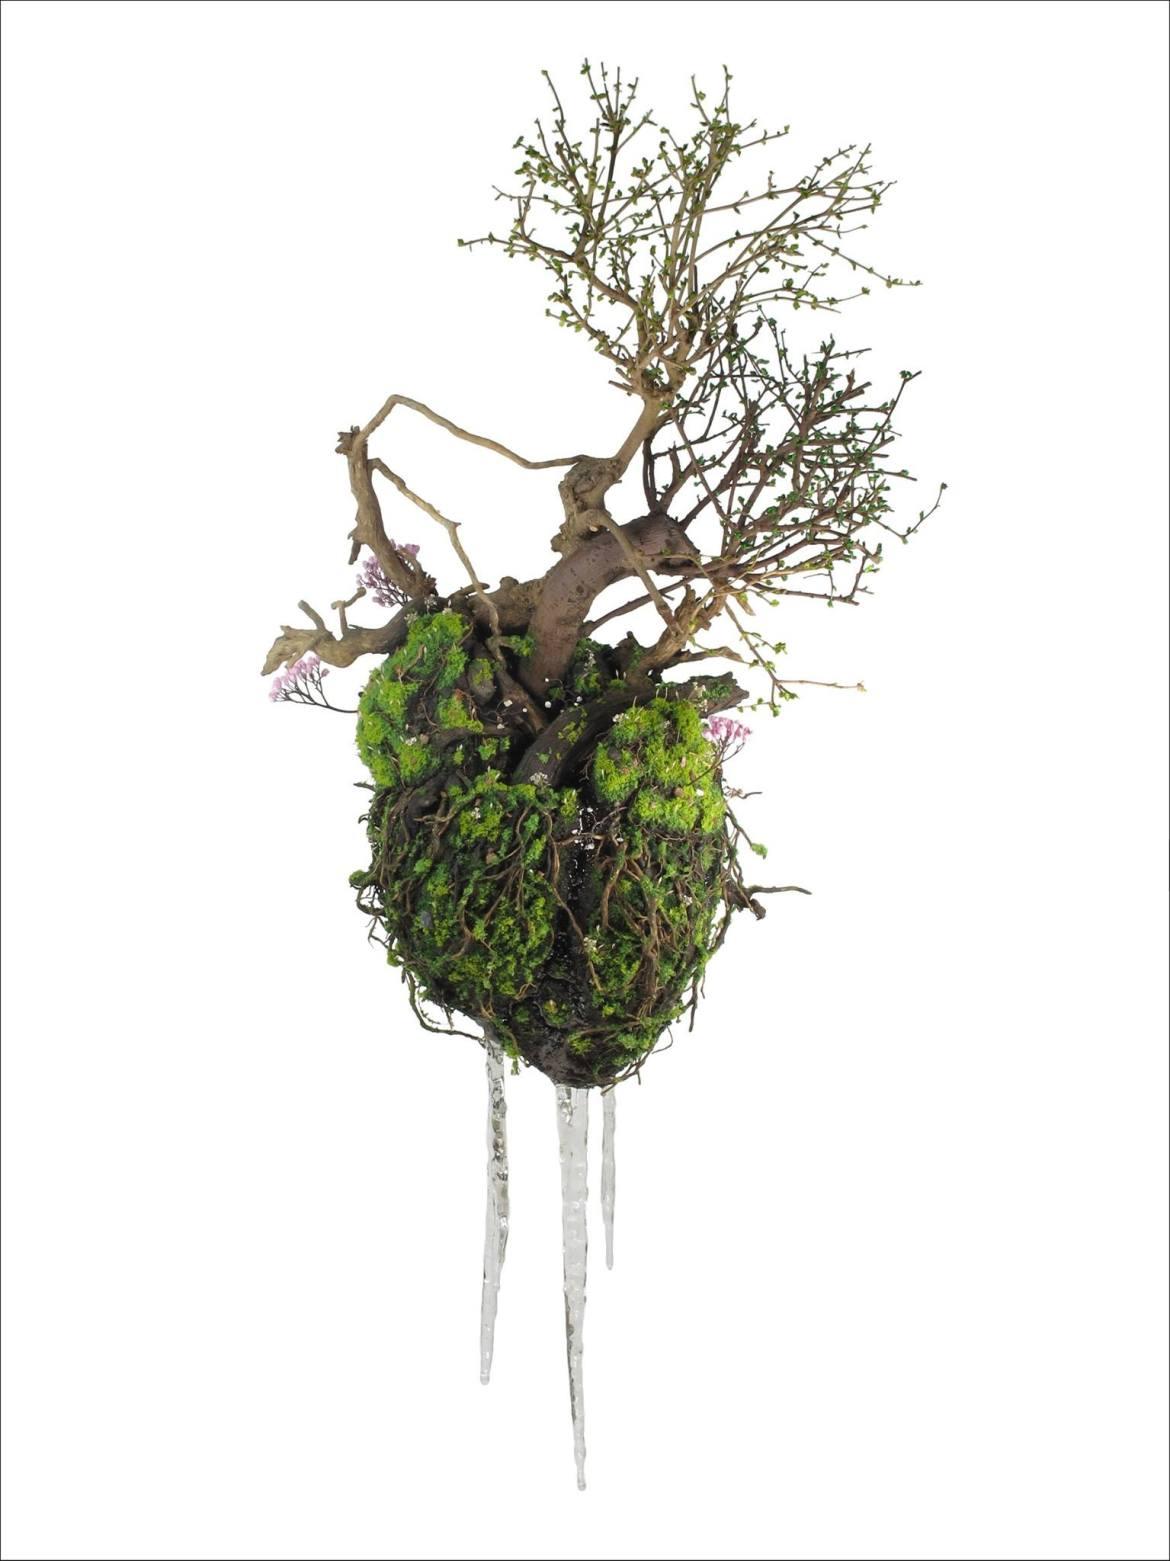 Emeric chantier- floral-sculptures-7